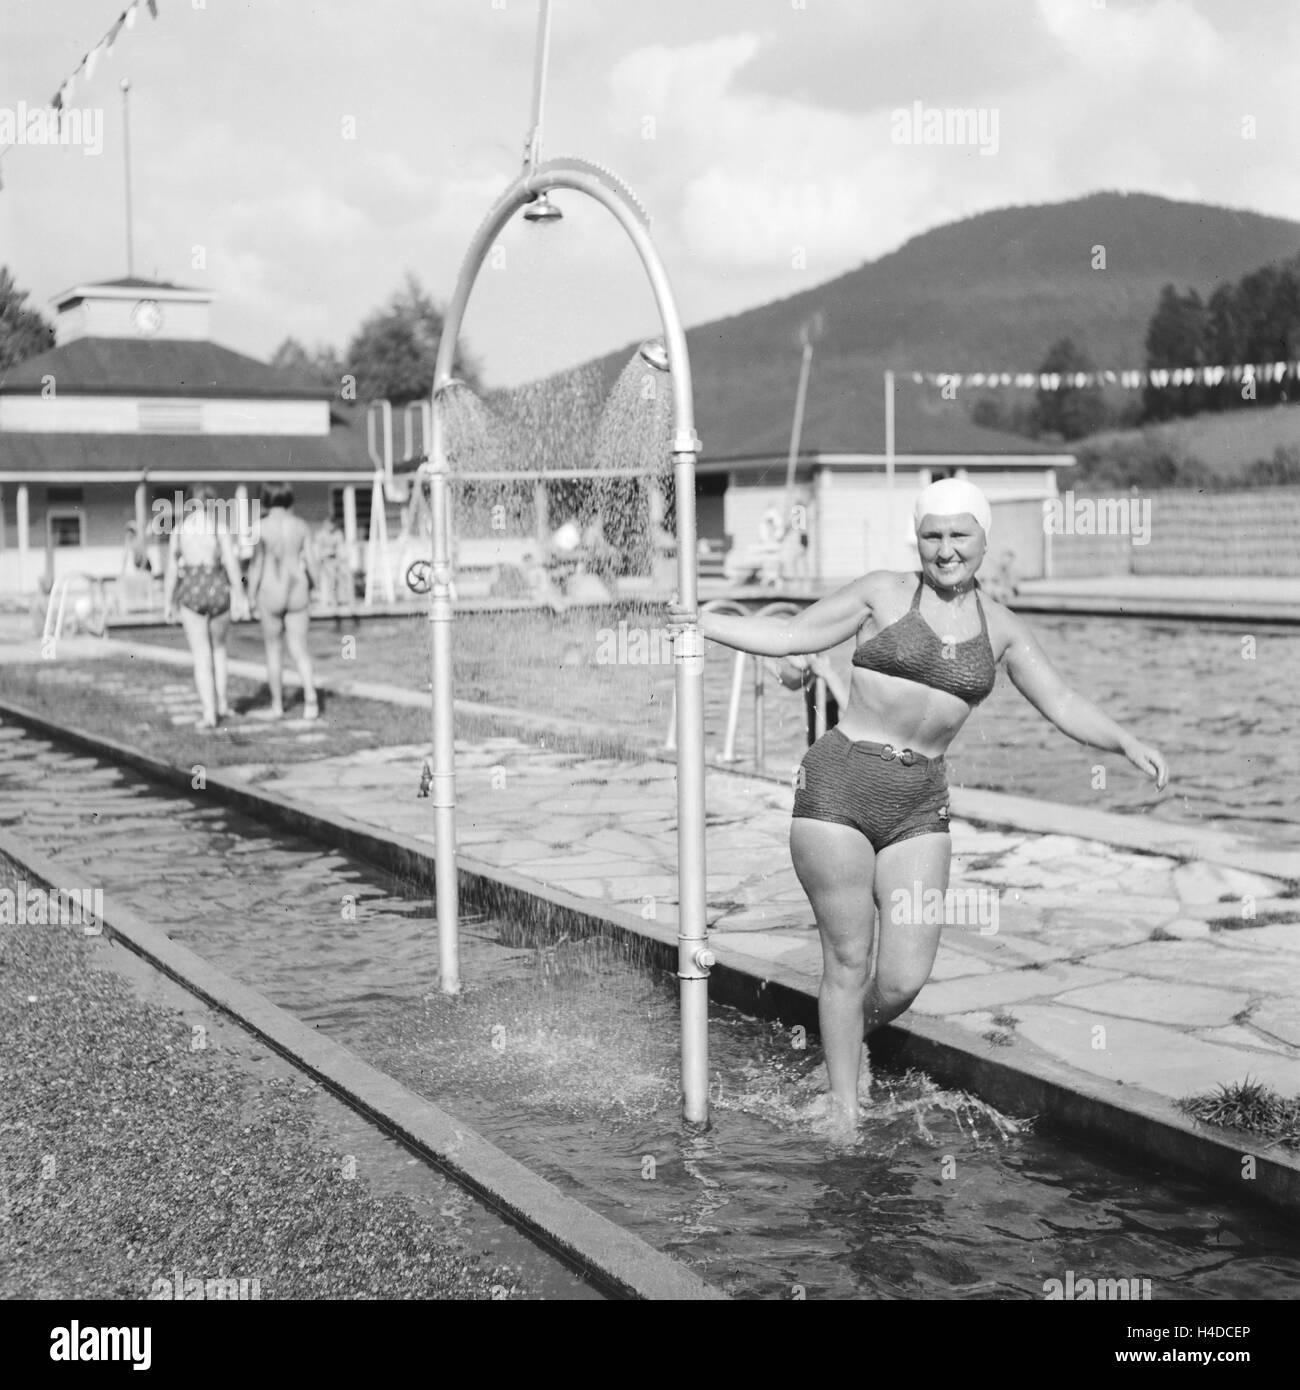 Gäste in einem Schwimmbad, Deutschland 1930er Jahre. Guests at a public pool, Germany 1930s. Stock Photo